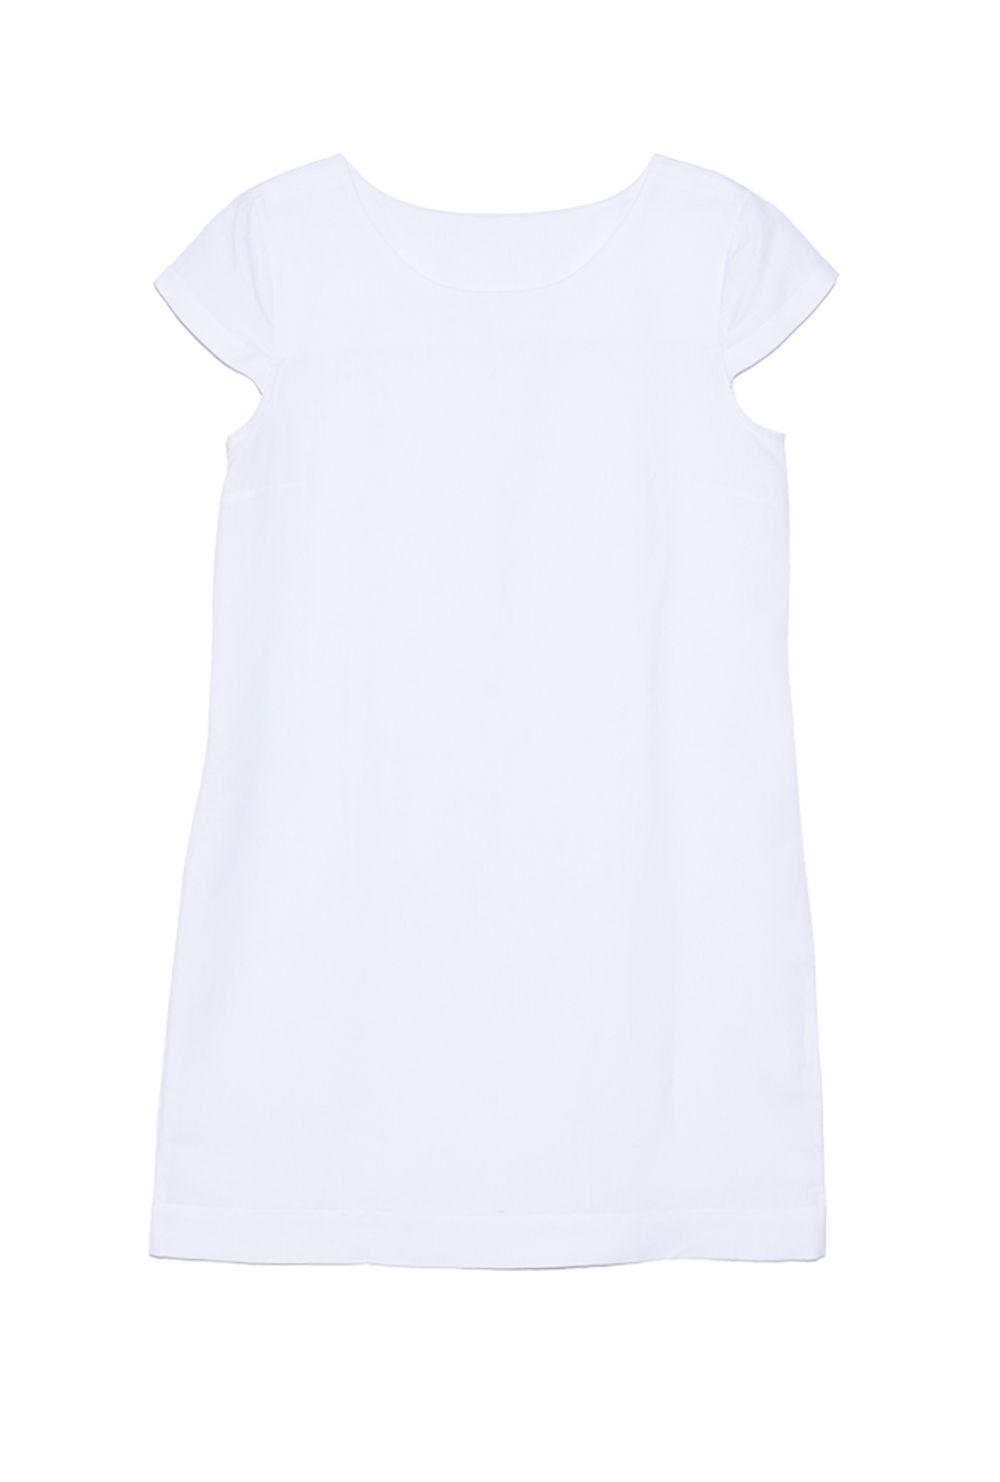 e745637fd Vestido Branco Básico Nassau - Mobile